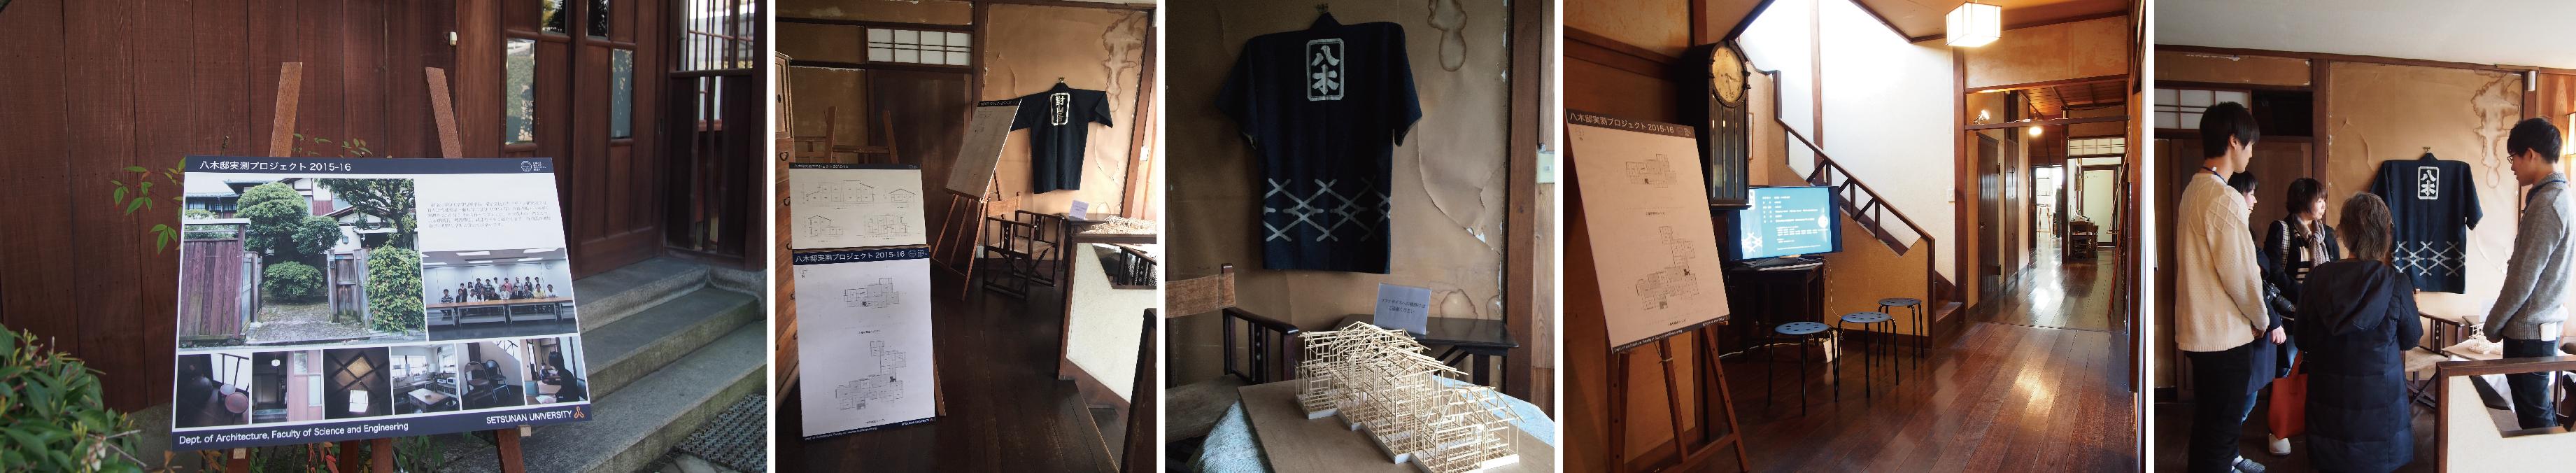 Case 01:藤井厚二設計の「香里園・八木邸」を実測